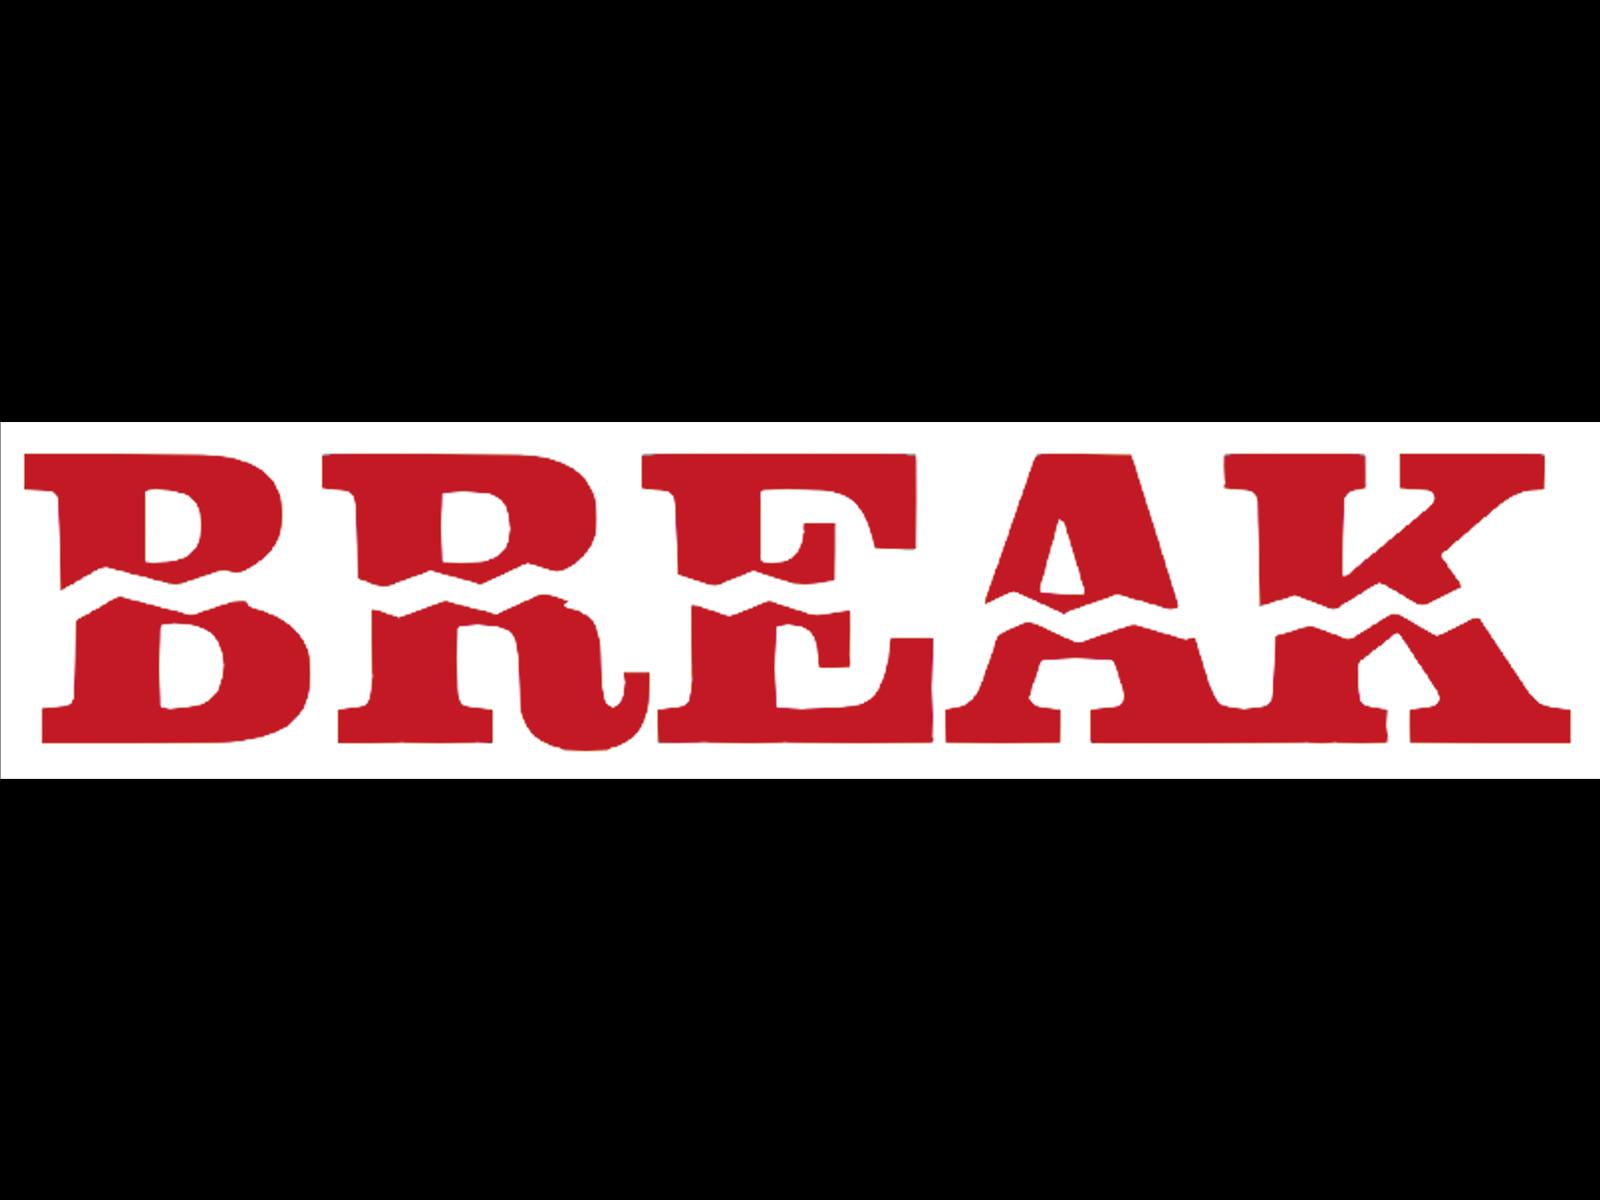 Pechauer Break-Queues